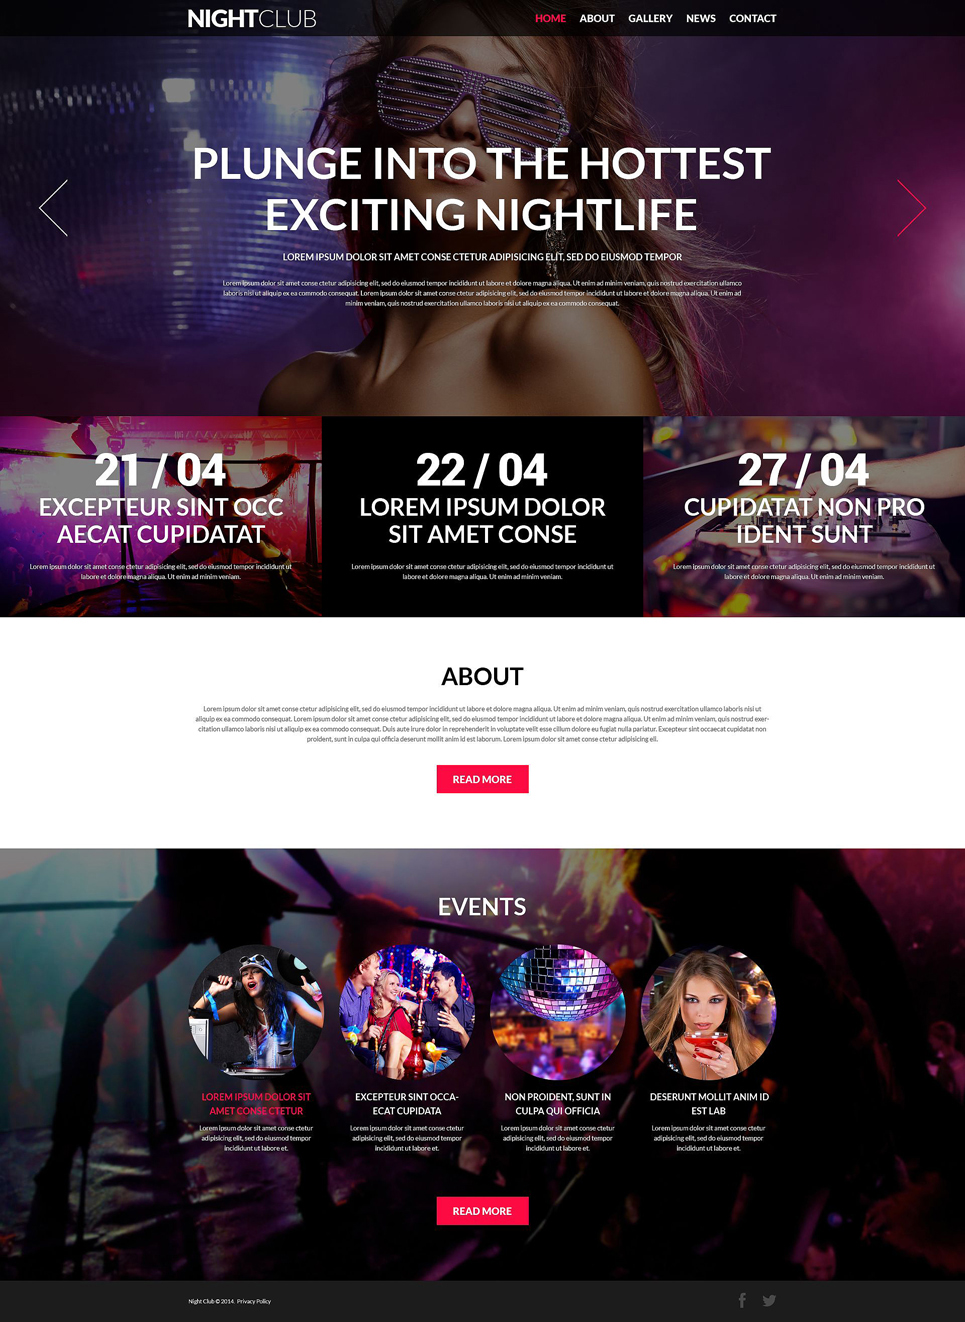 joomla empty template - nightclub joomla template